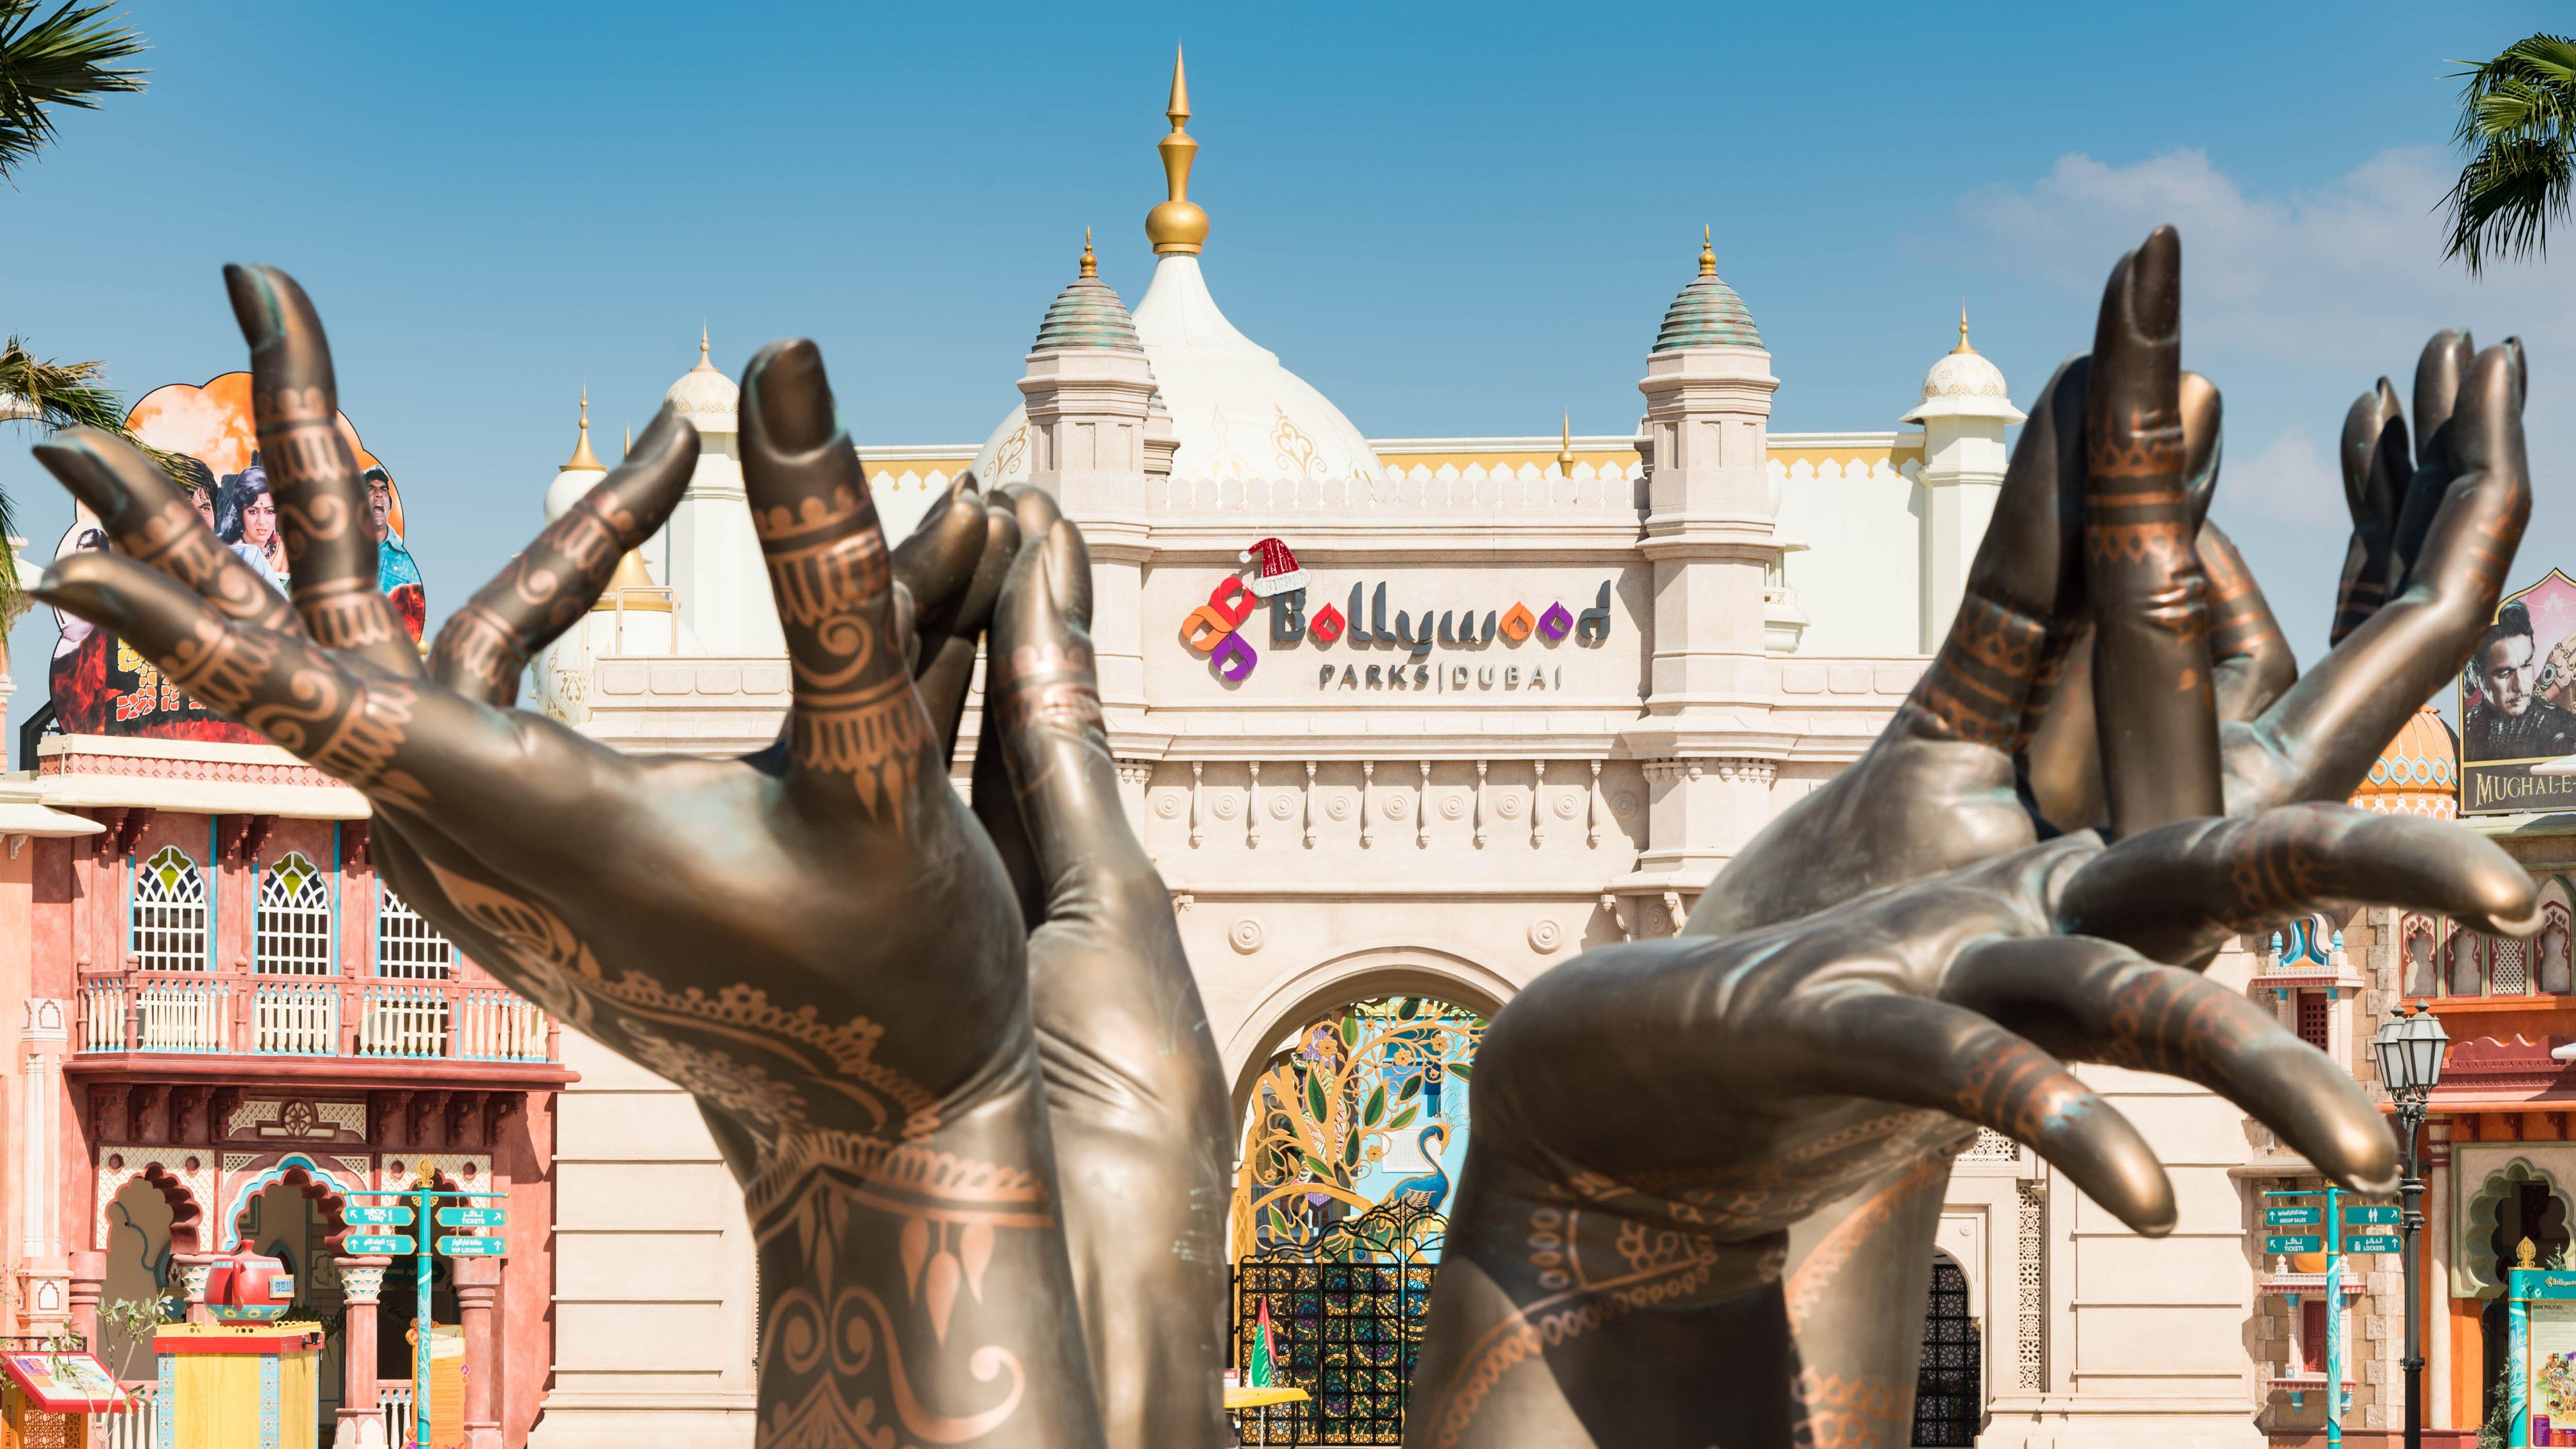 The gate of the Bollywood theme park in Dubai